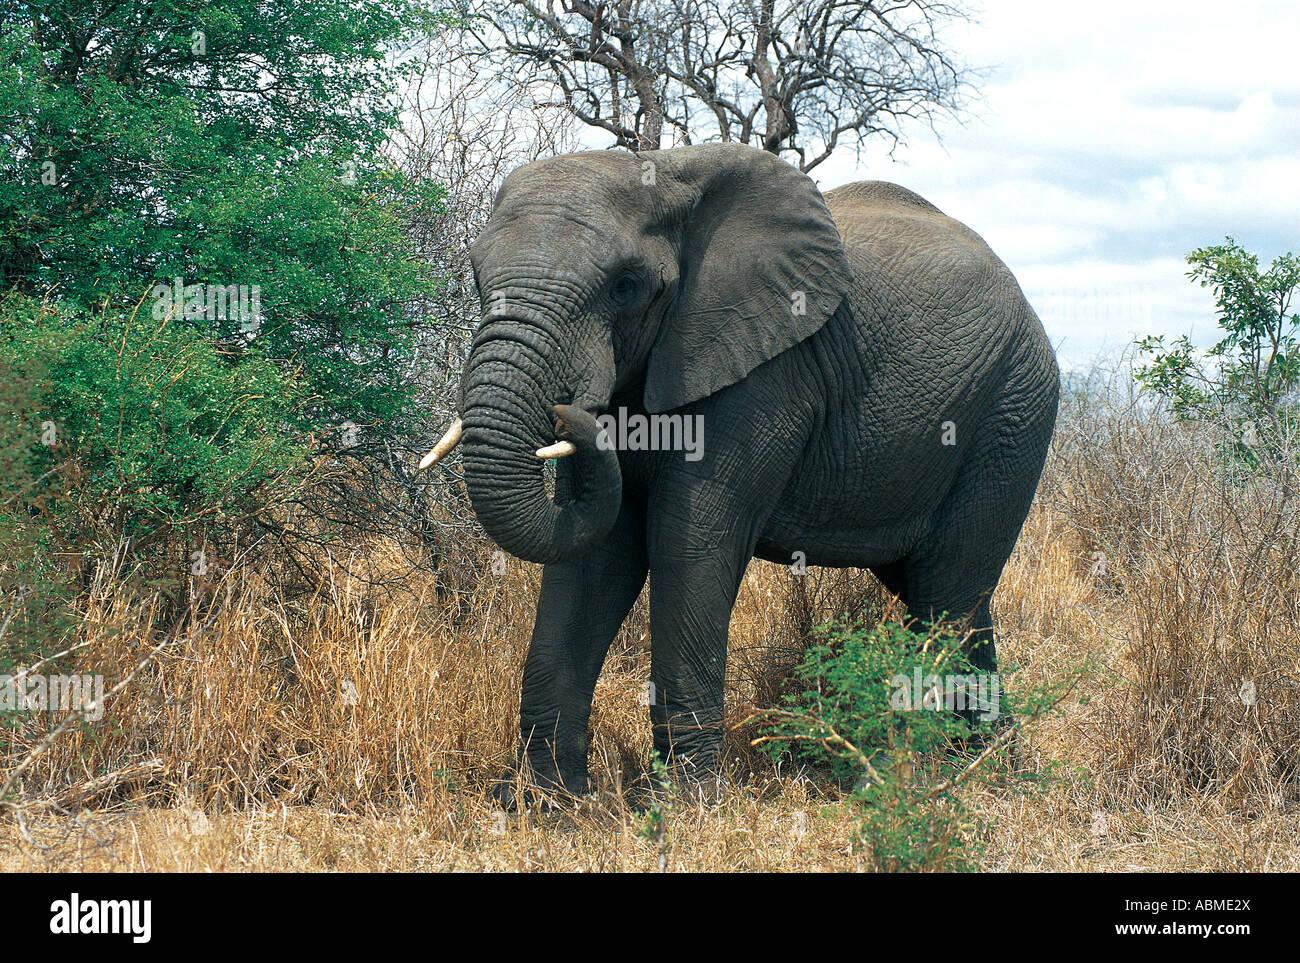 Elefante africano Parco Nazionale Kruger Sud Africa Immagini Stock